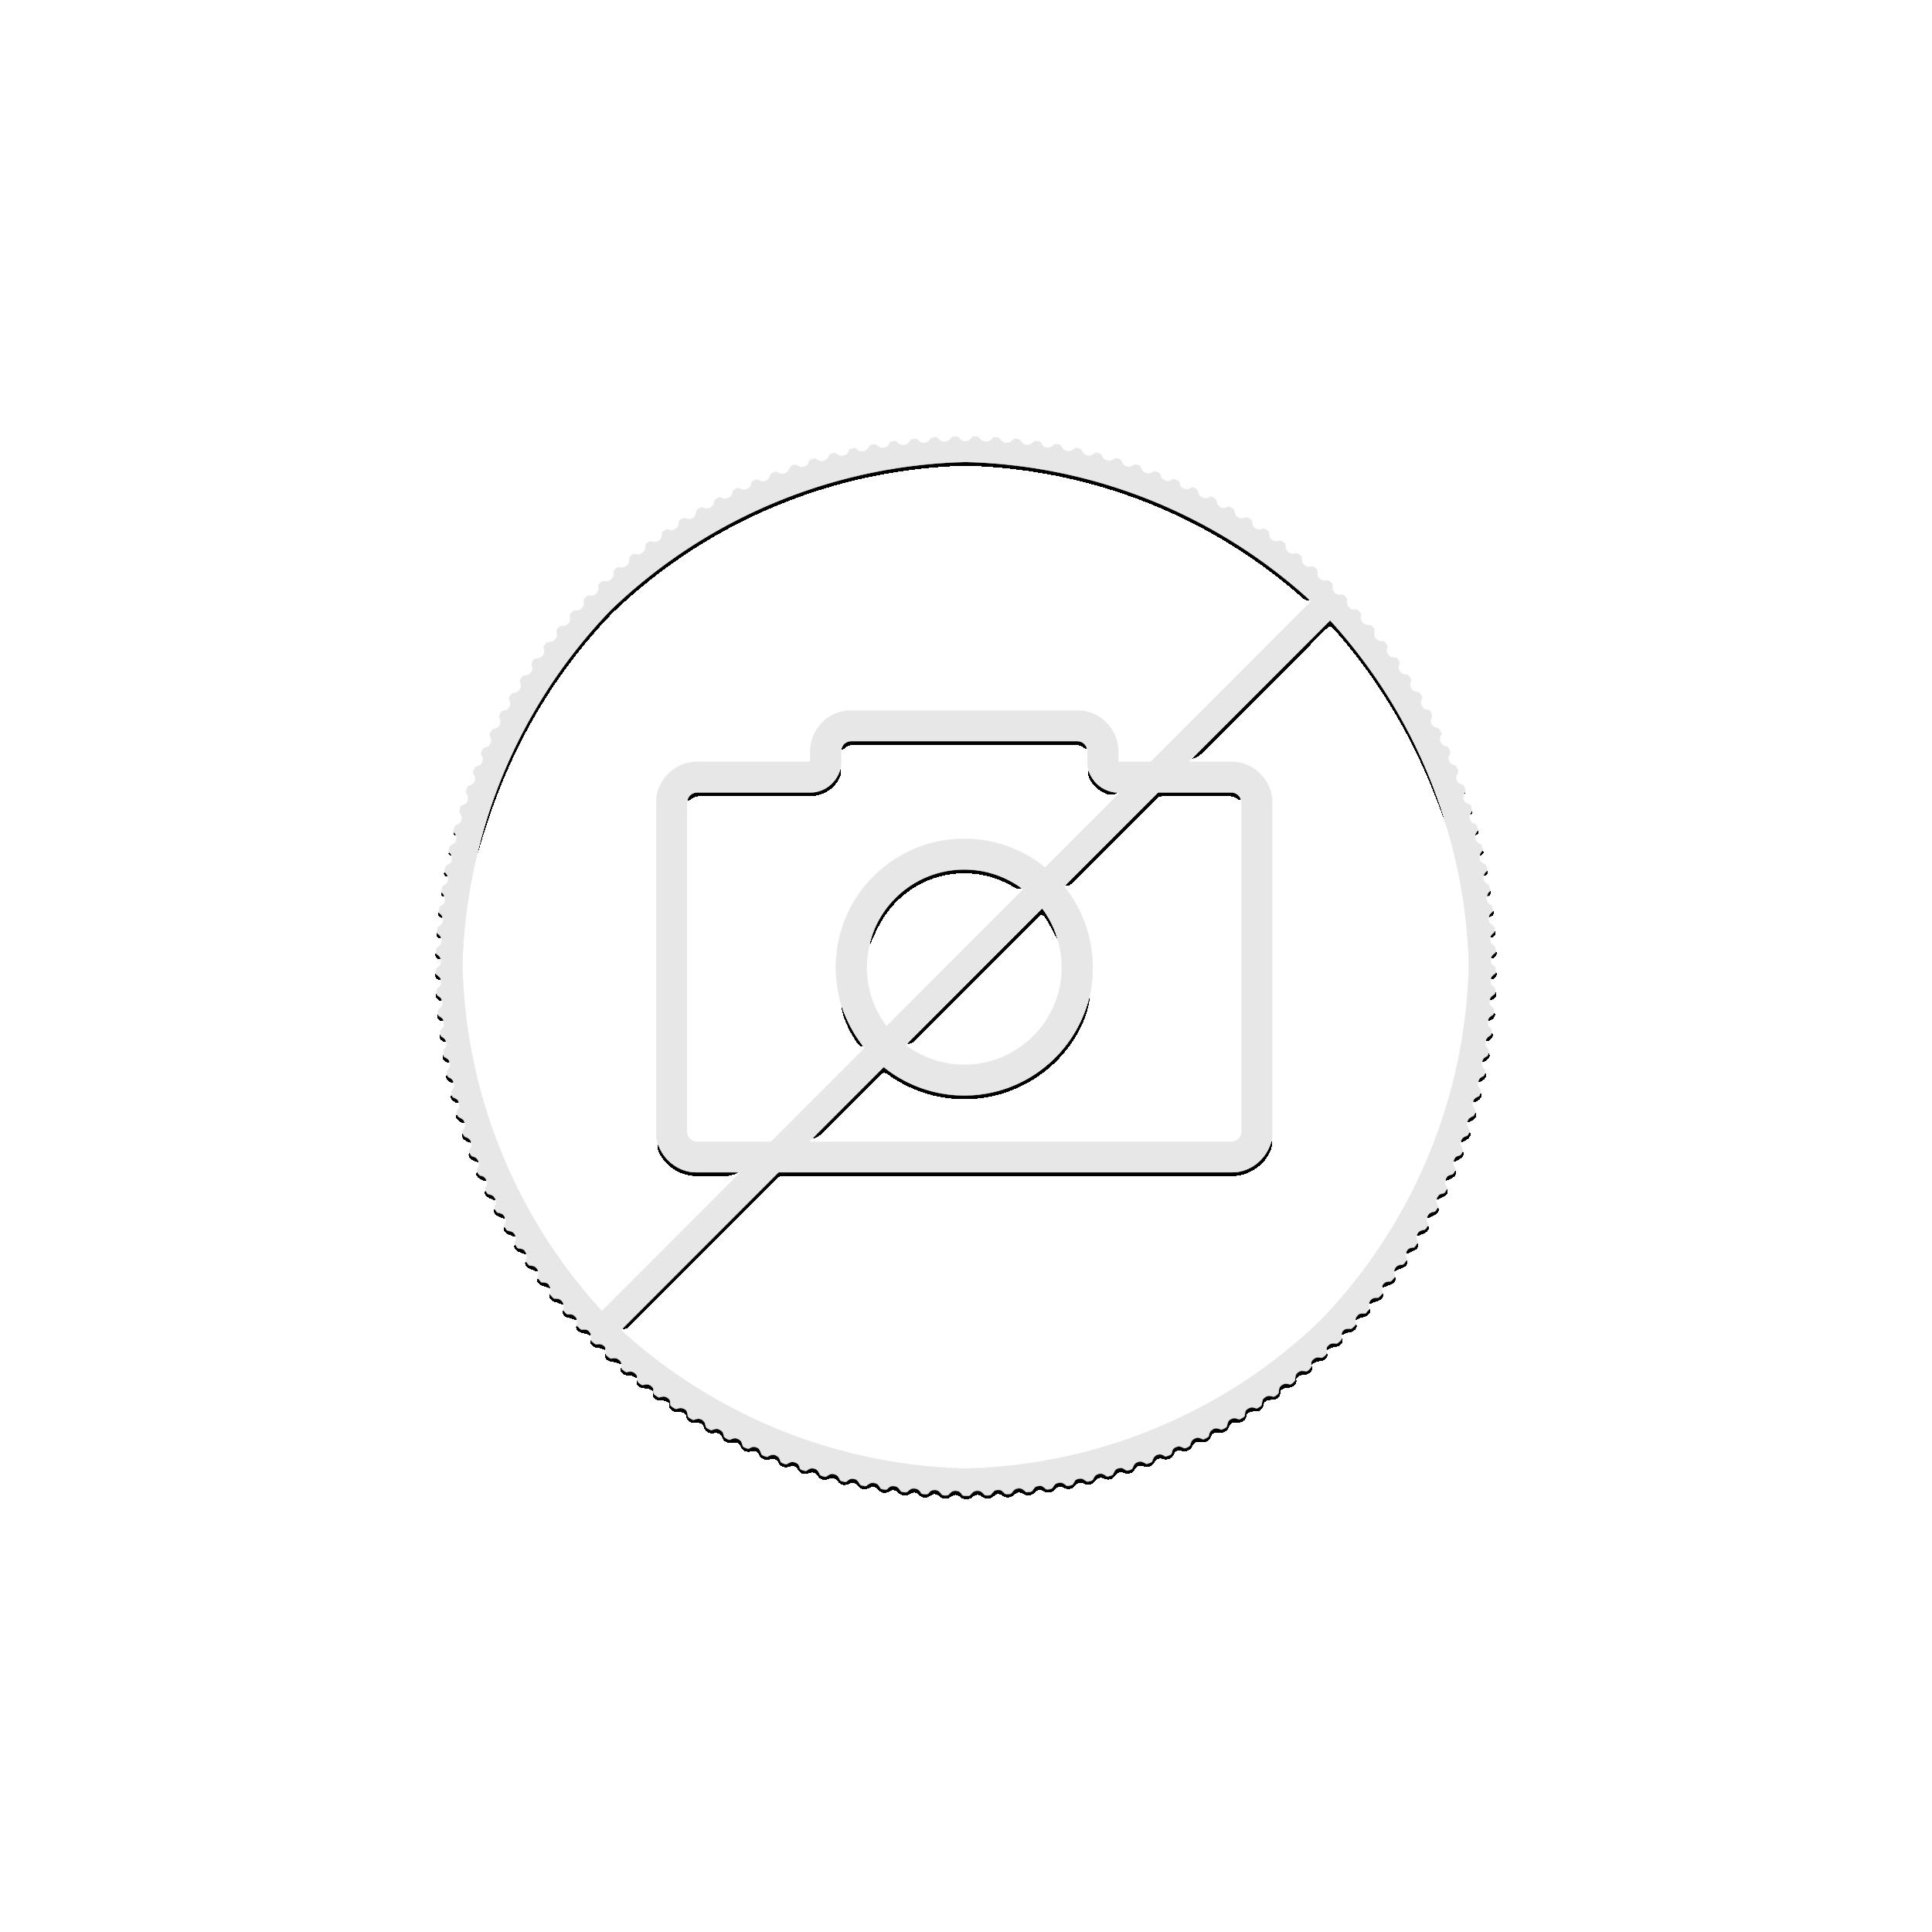 Gouden munt Unie van Utrecht 1979